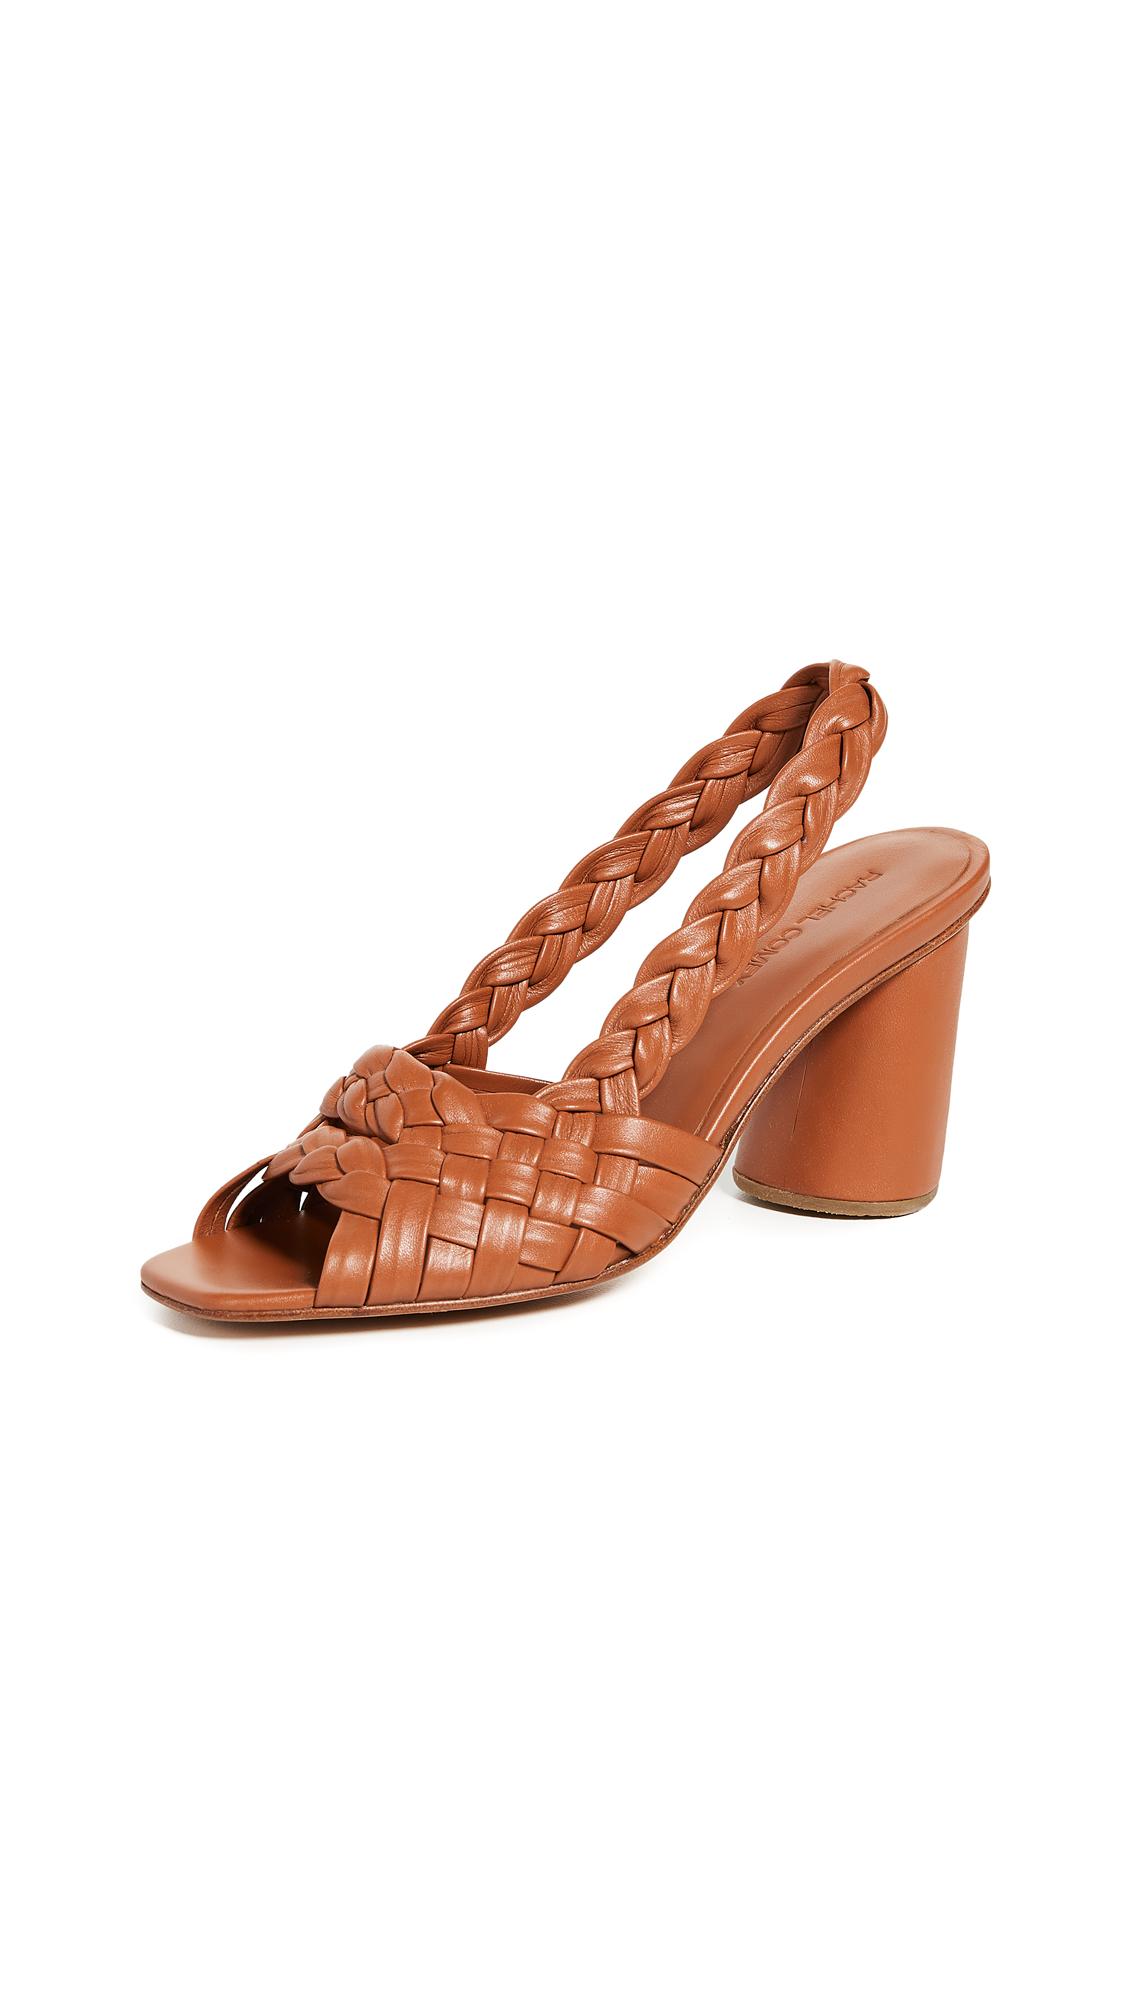 Rachel Comey Zion Slingback Sandals - Tawny